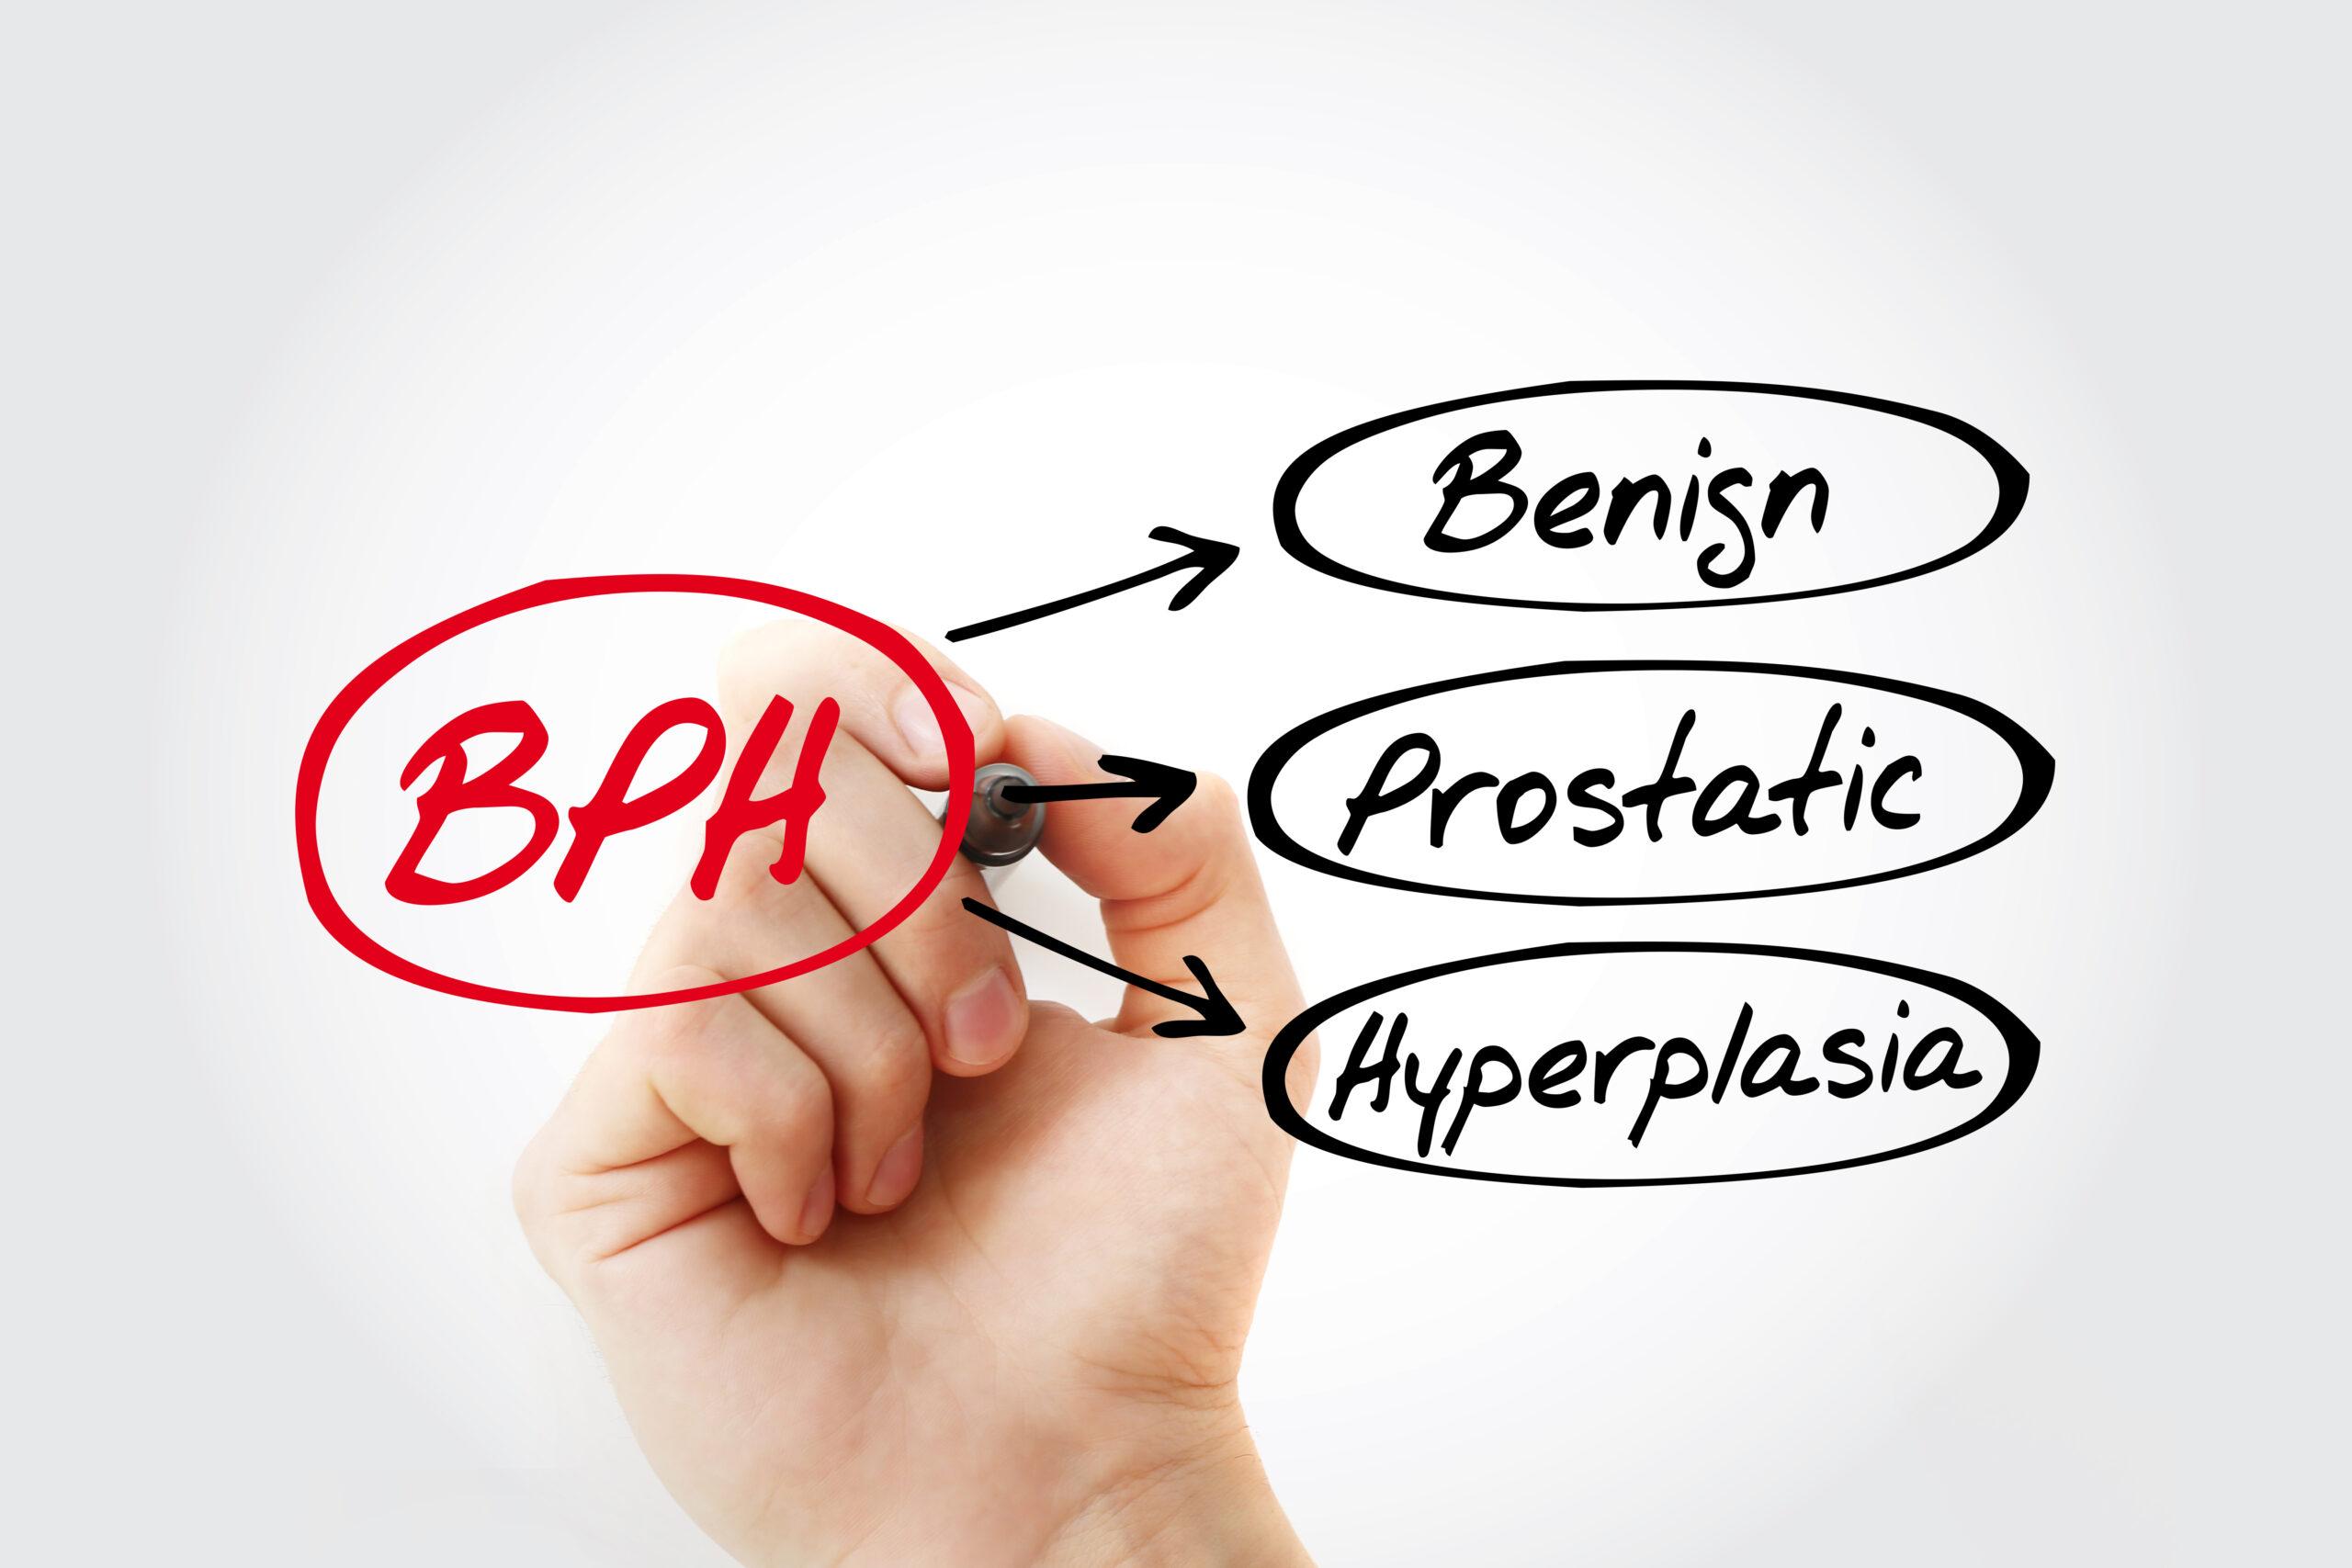 Benign Prostatic Hyperplasia: Everything You Need to Know